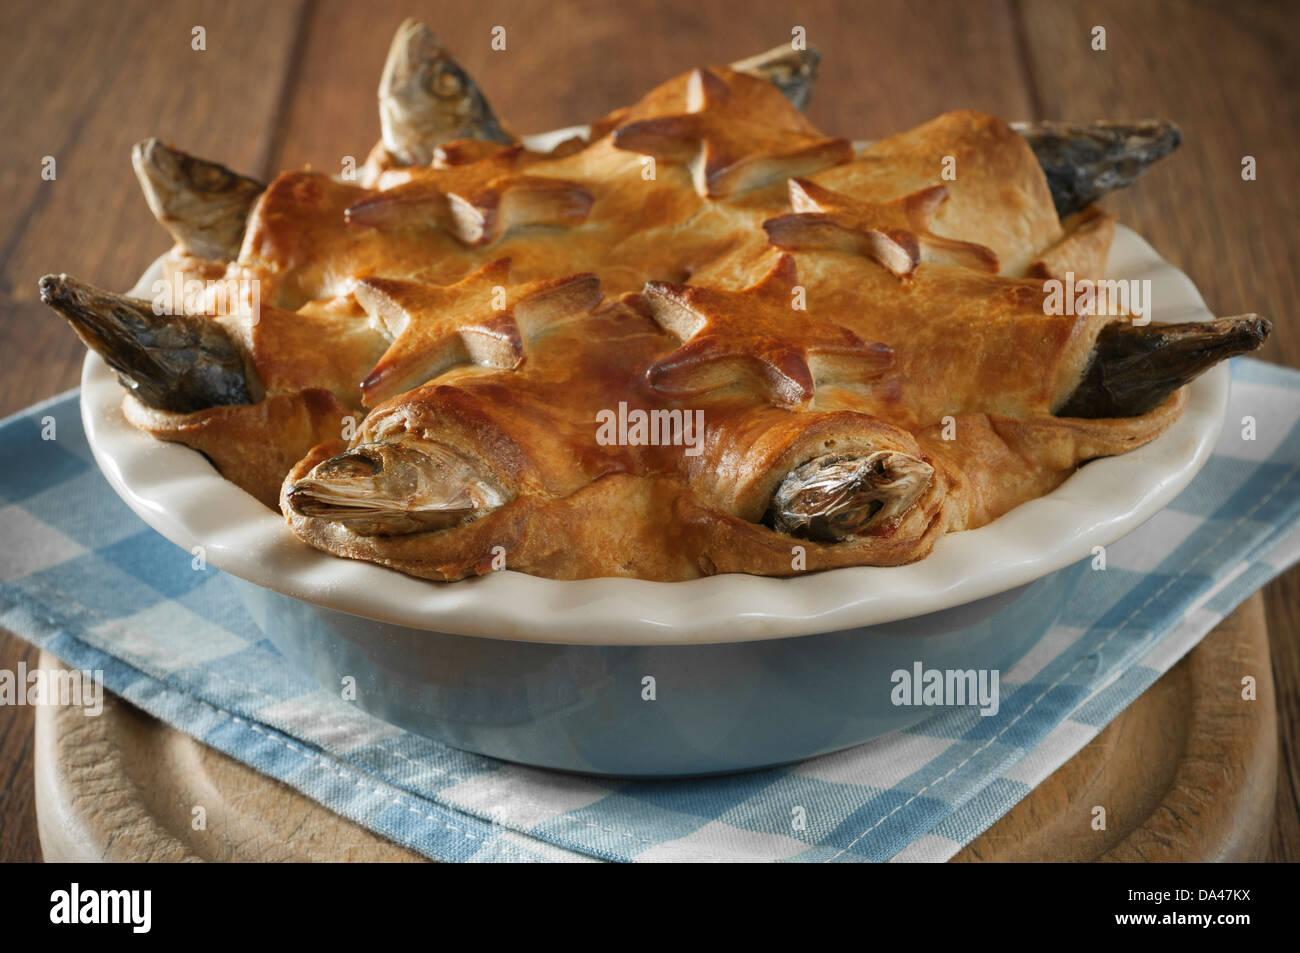 Stargazy pie West Country fish dish Cornwall UK Stock Photo - Alamy